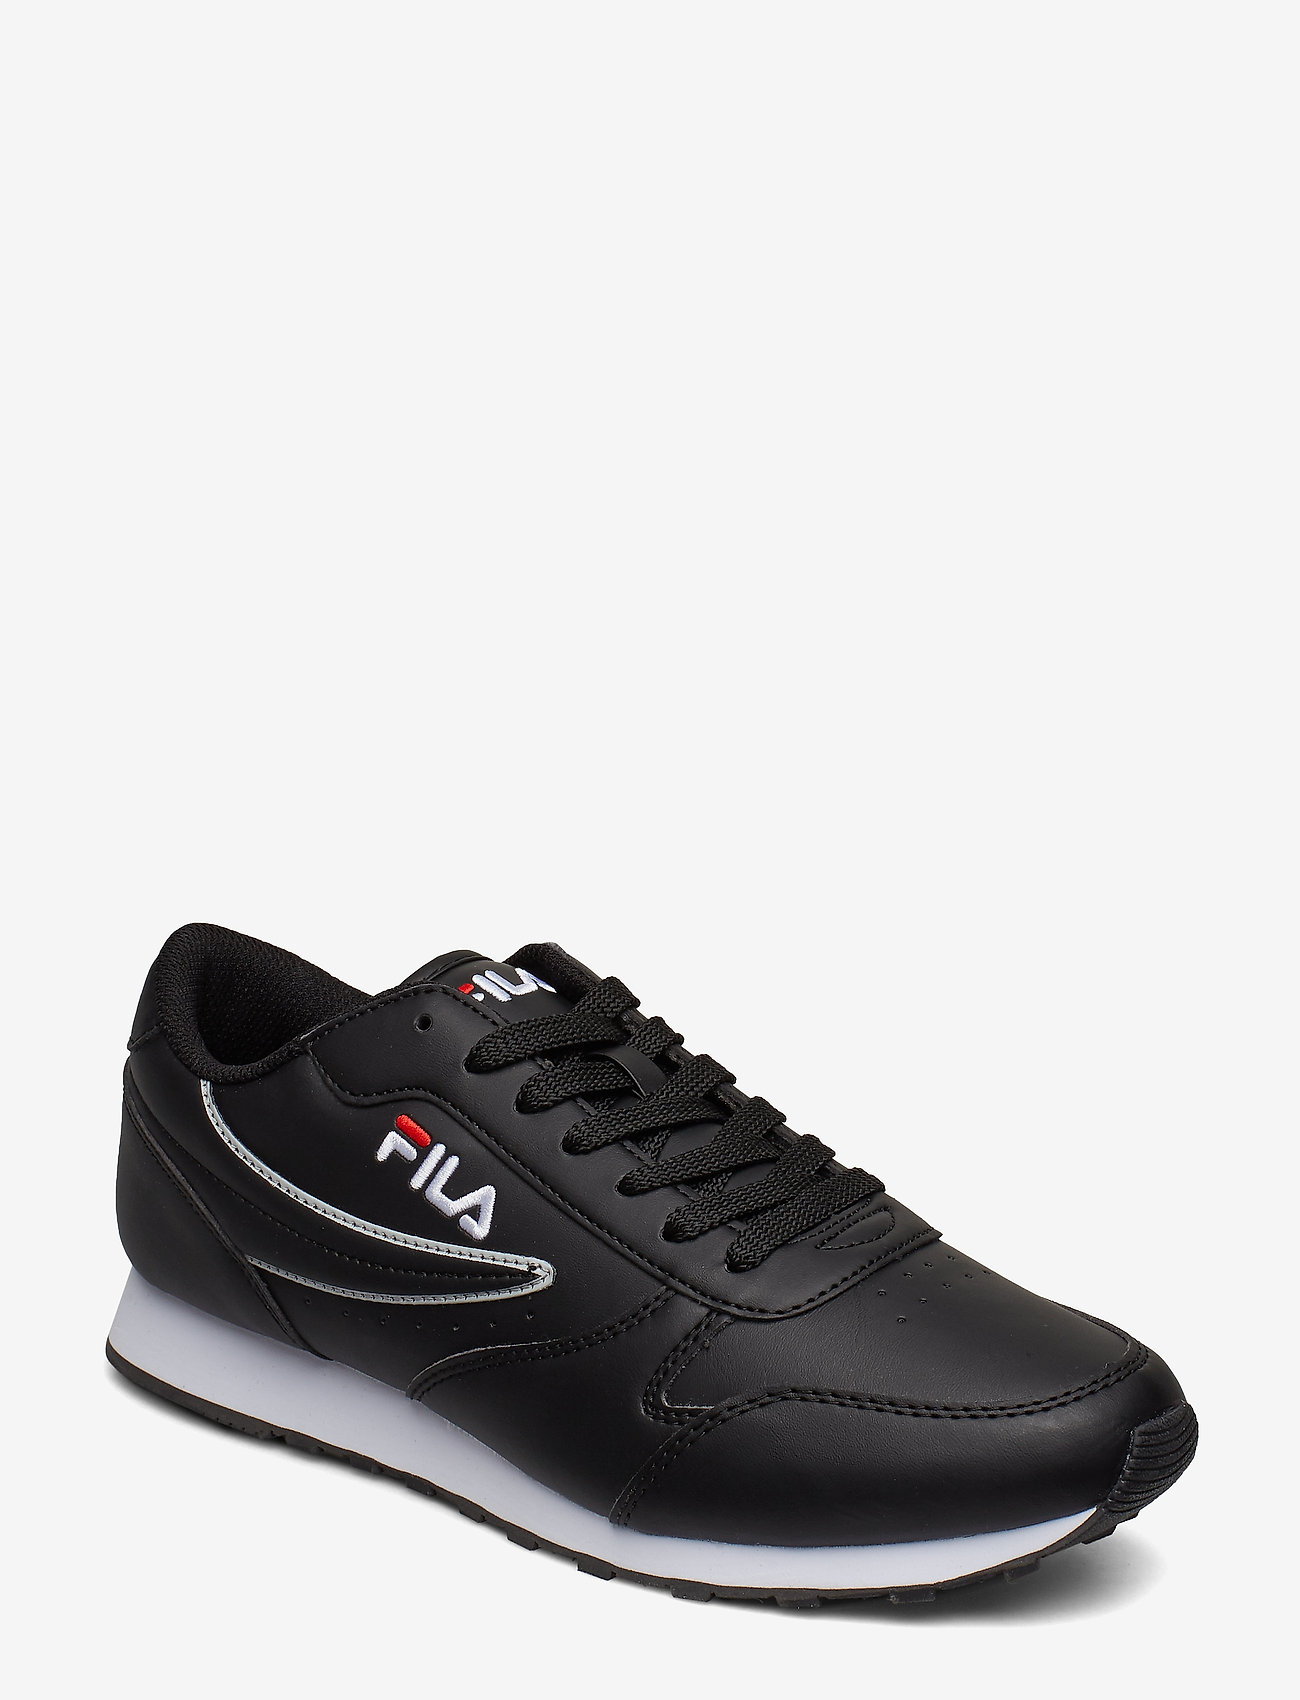 FILA - Orbit low - baskets basses - black - 0